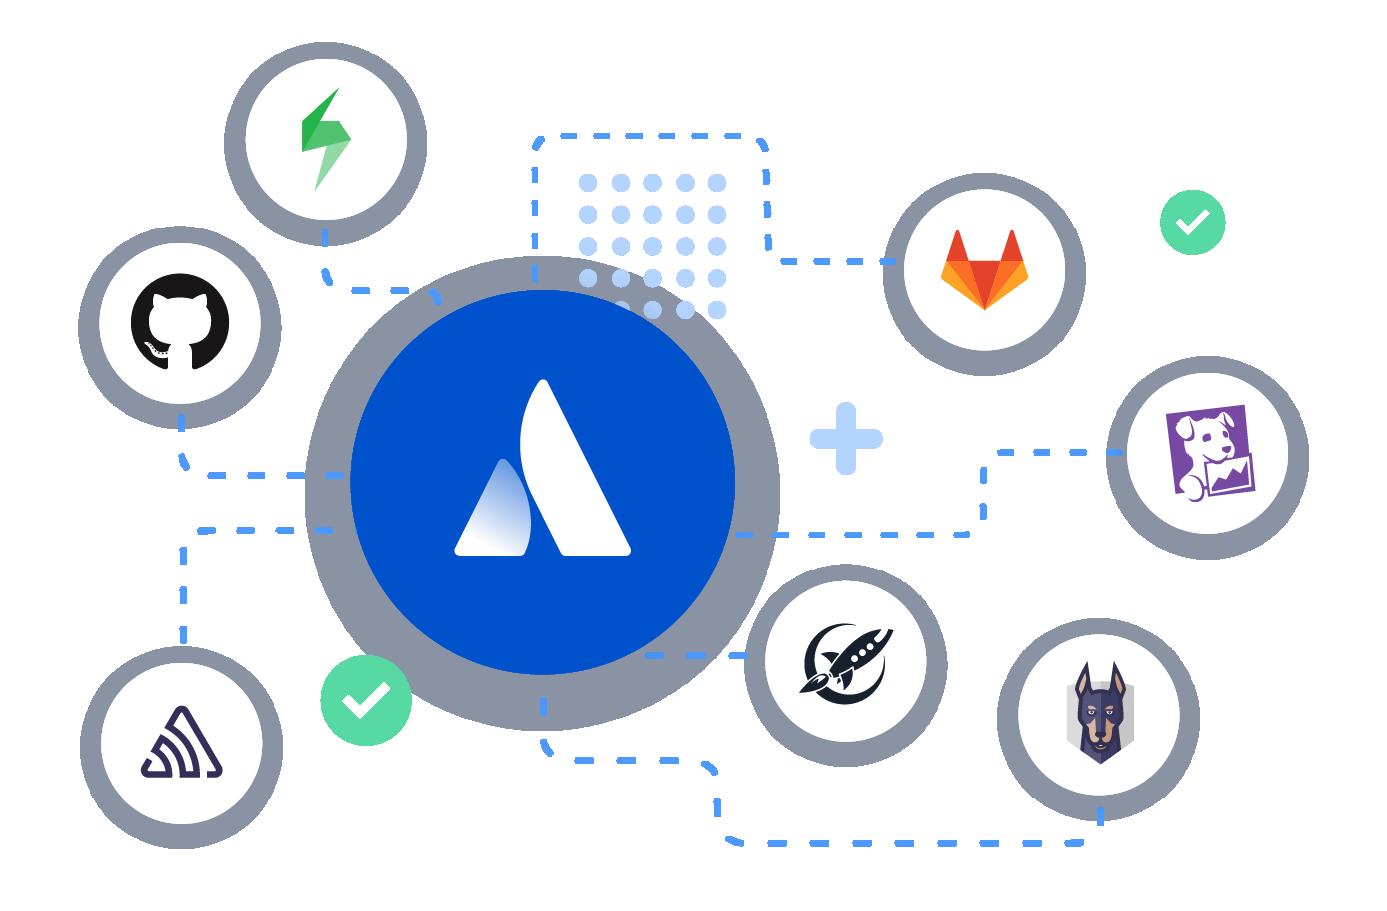 Интеграции Atlassian DevOps